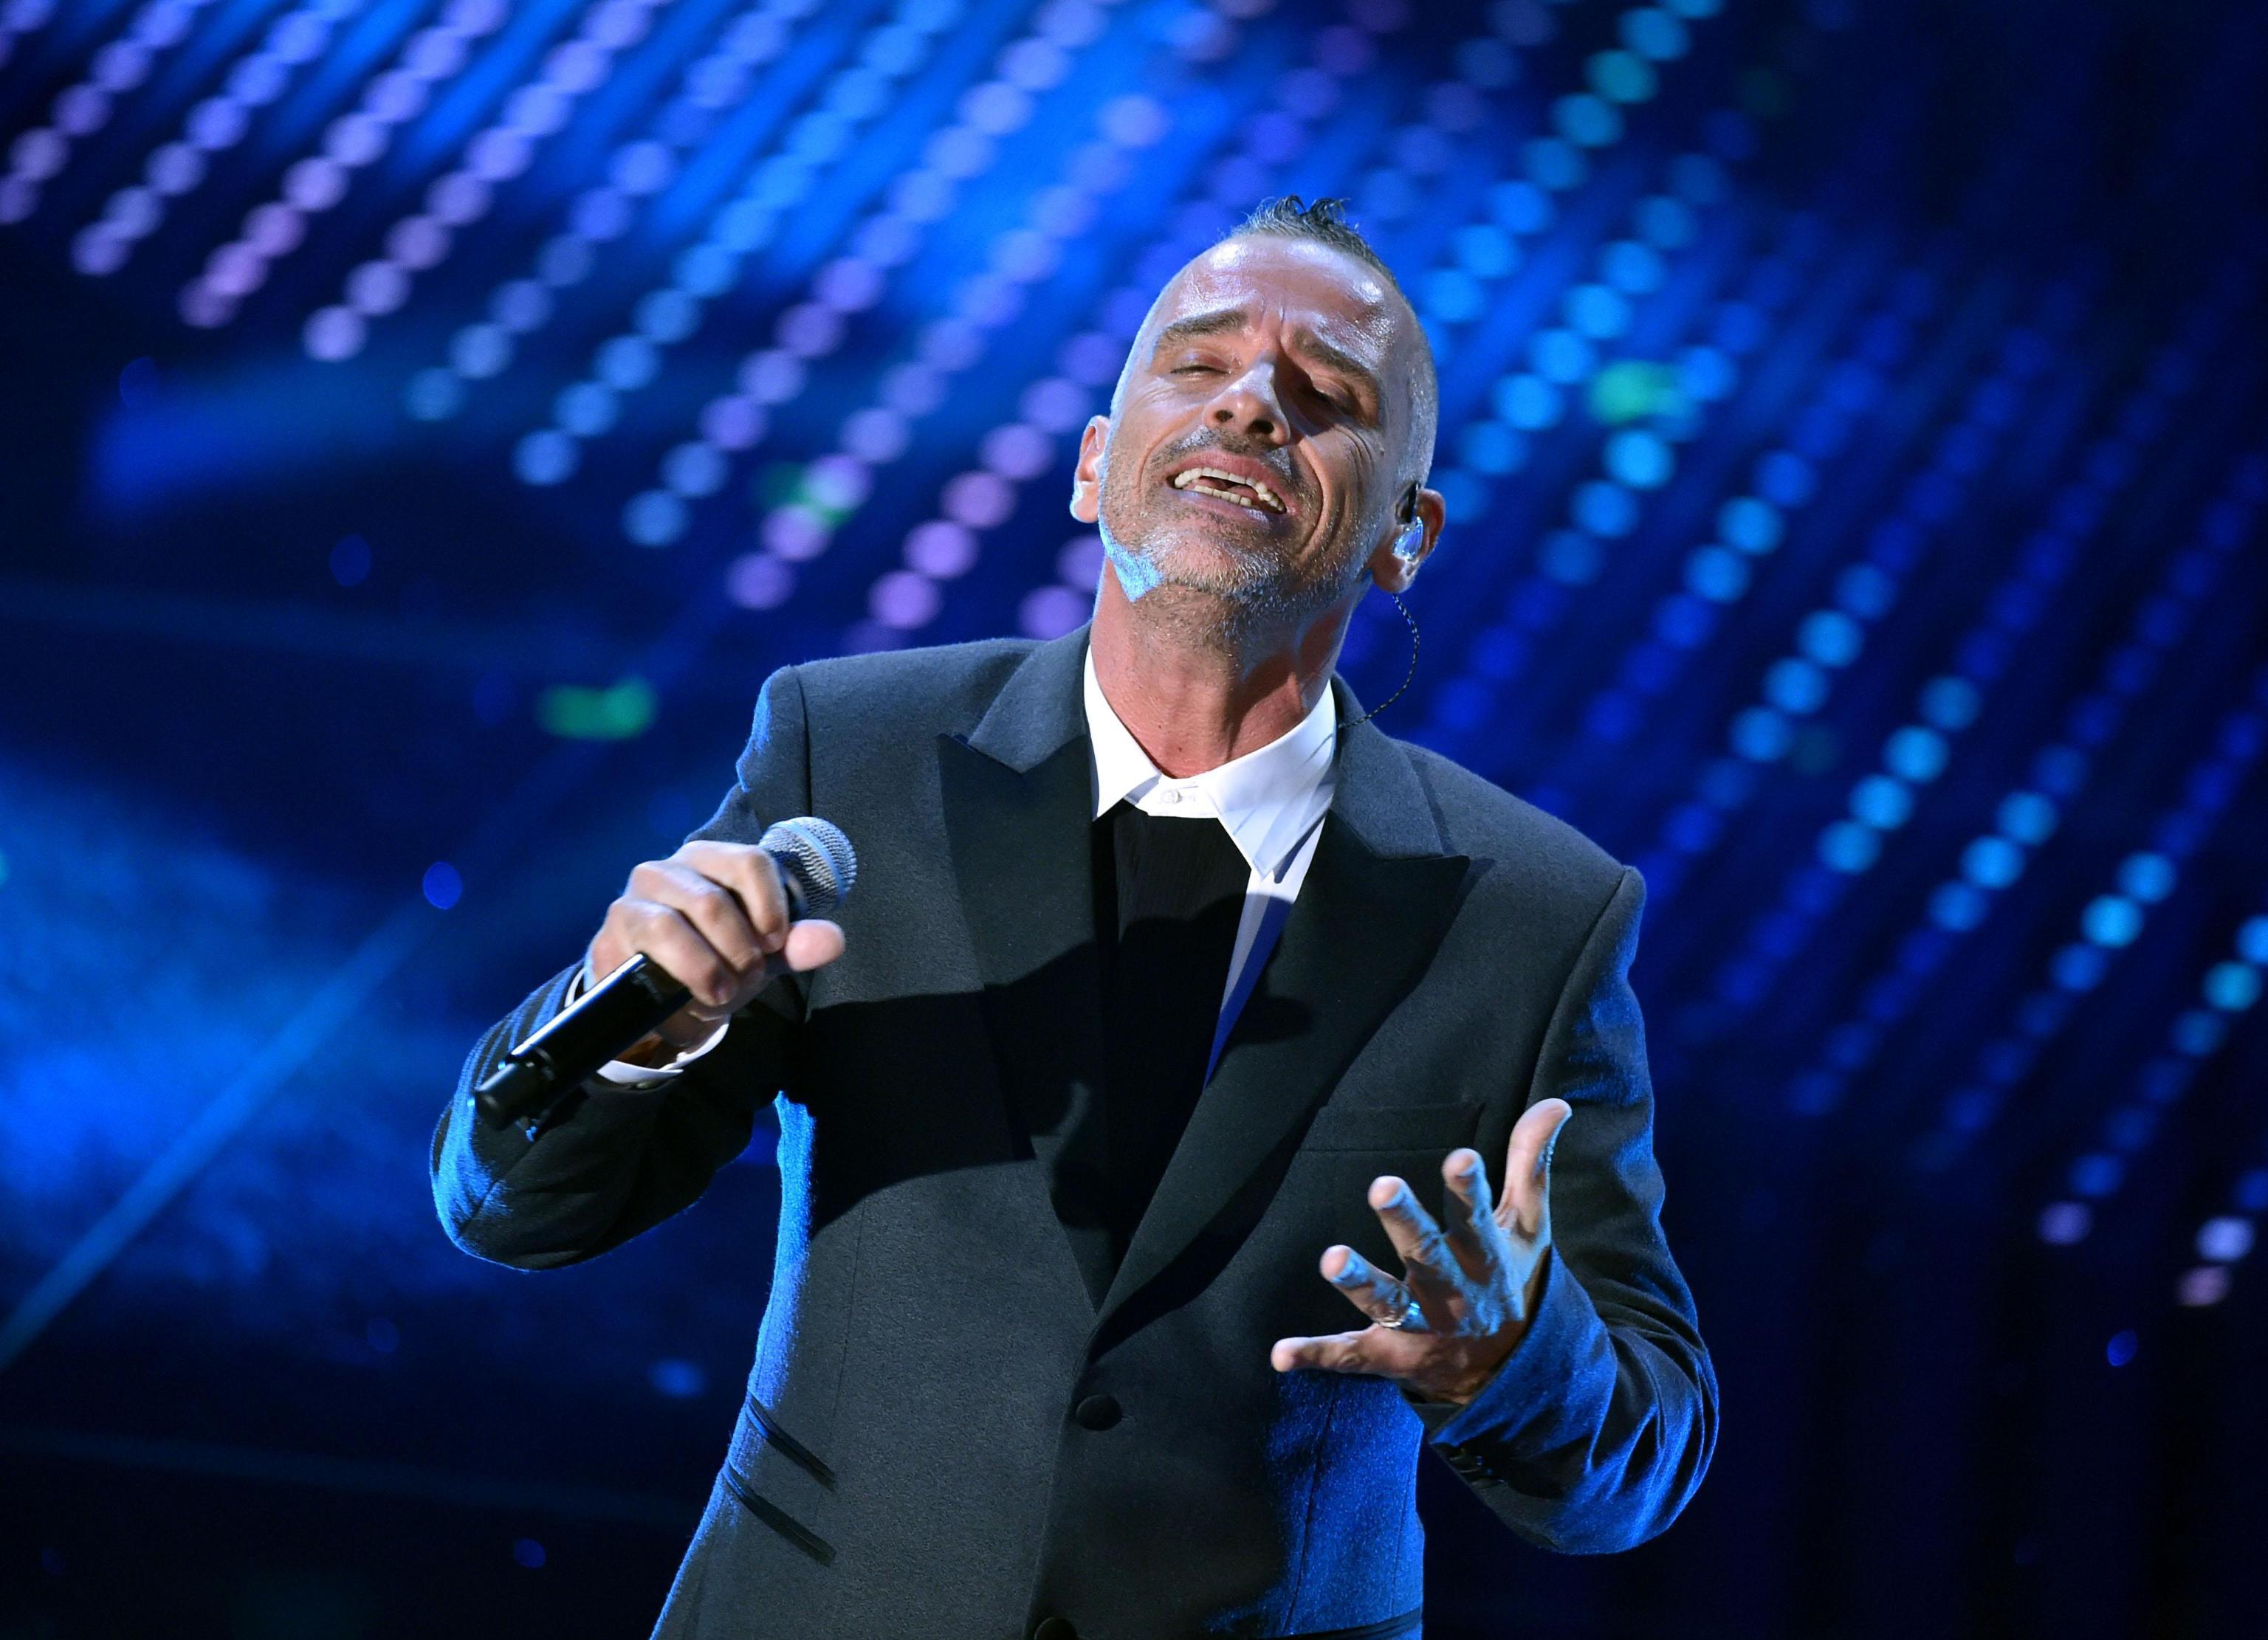 Sanremo Music Festival 2016